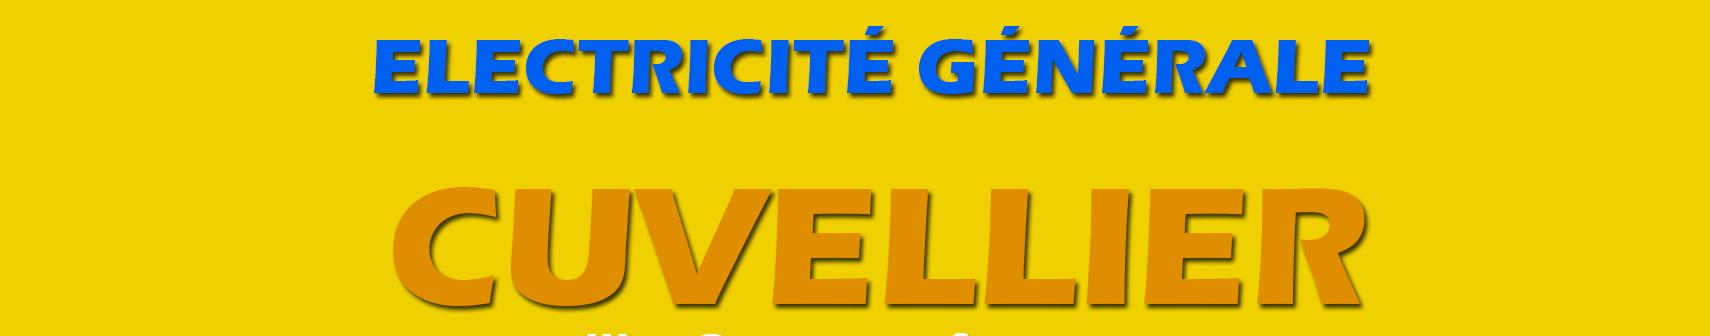 bandeau_cuvellier